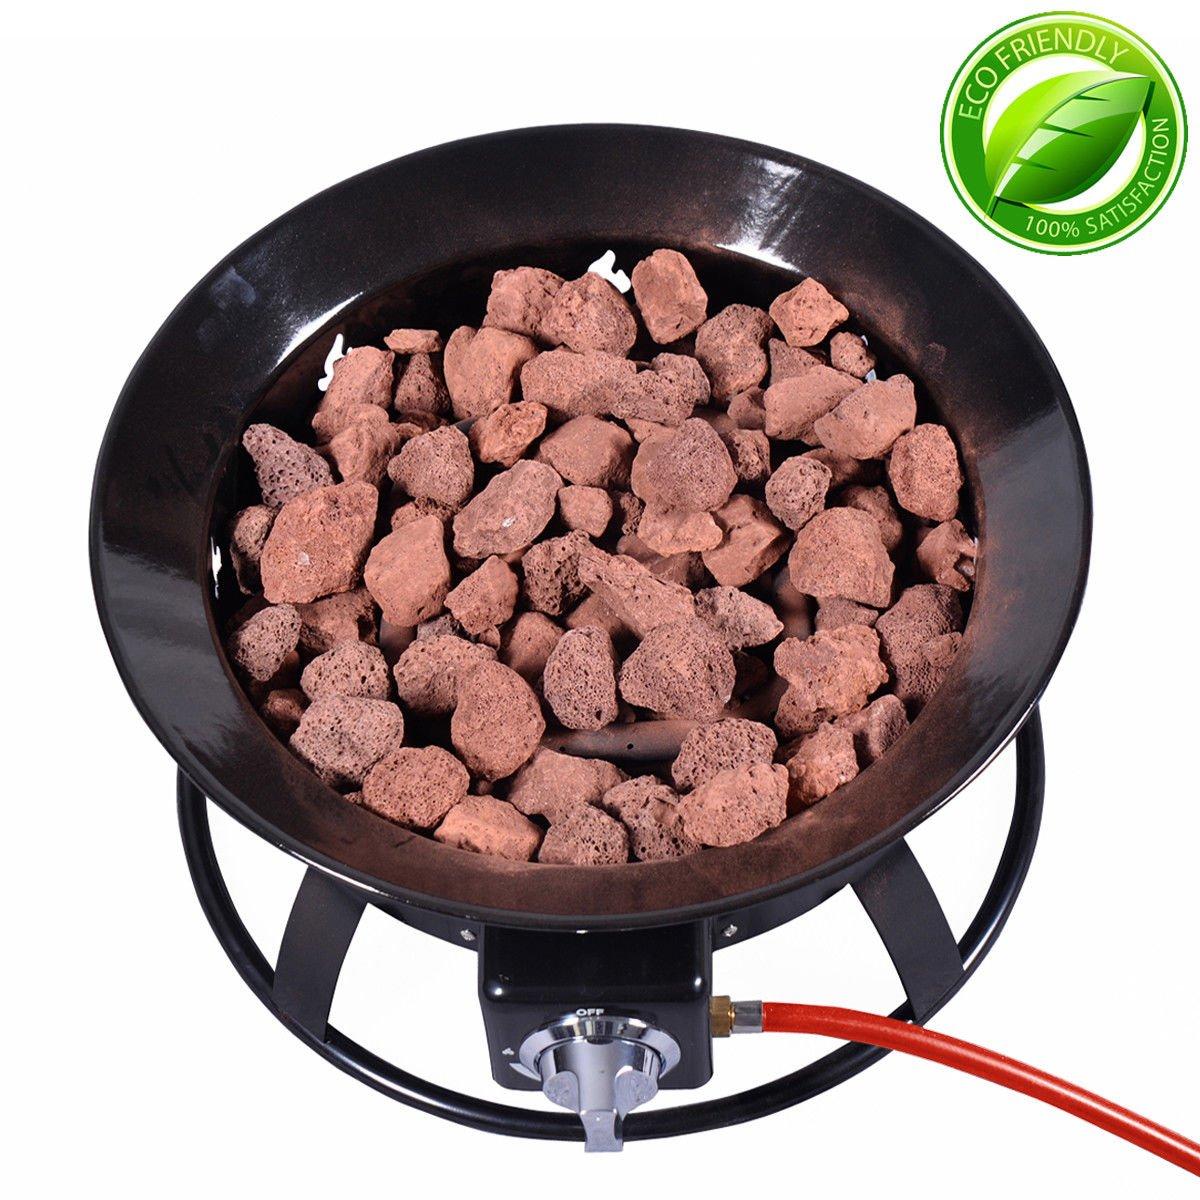 Outdoor Gas Fire Pit Steel Patio Heater Portable Firepit Garden Fireplace Bowl